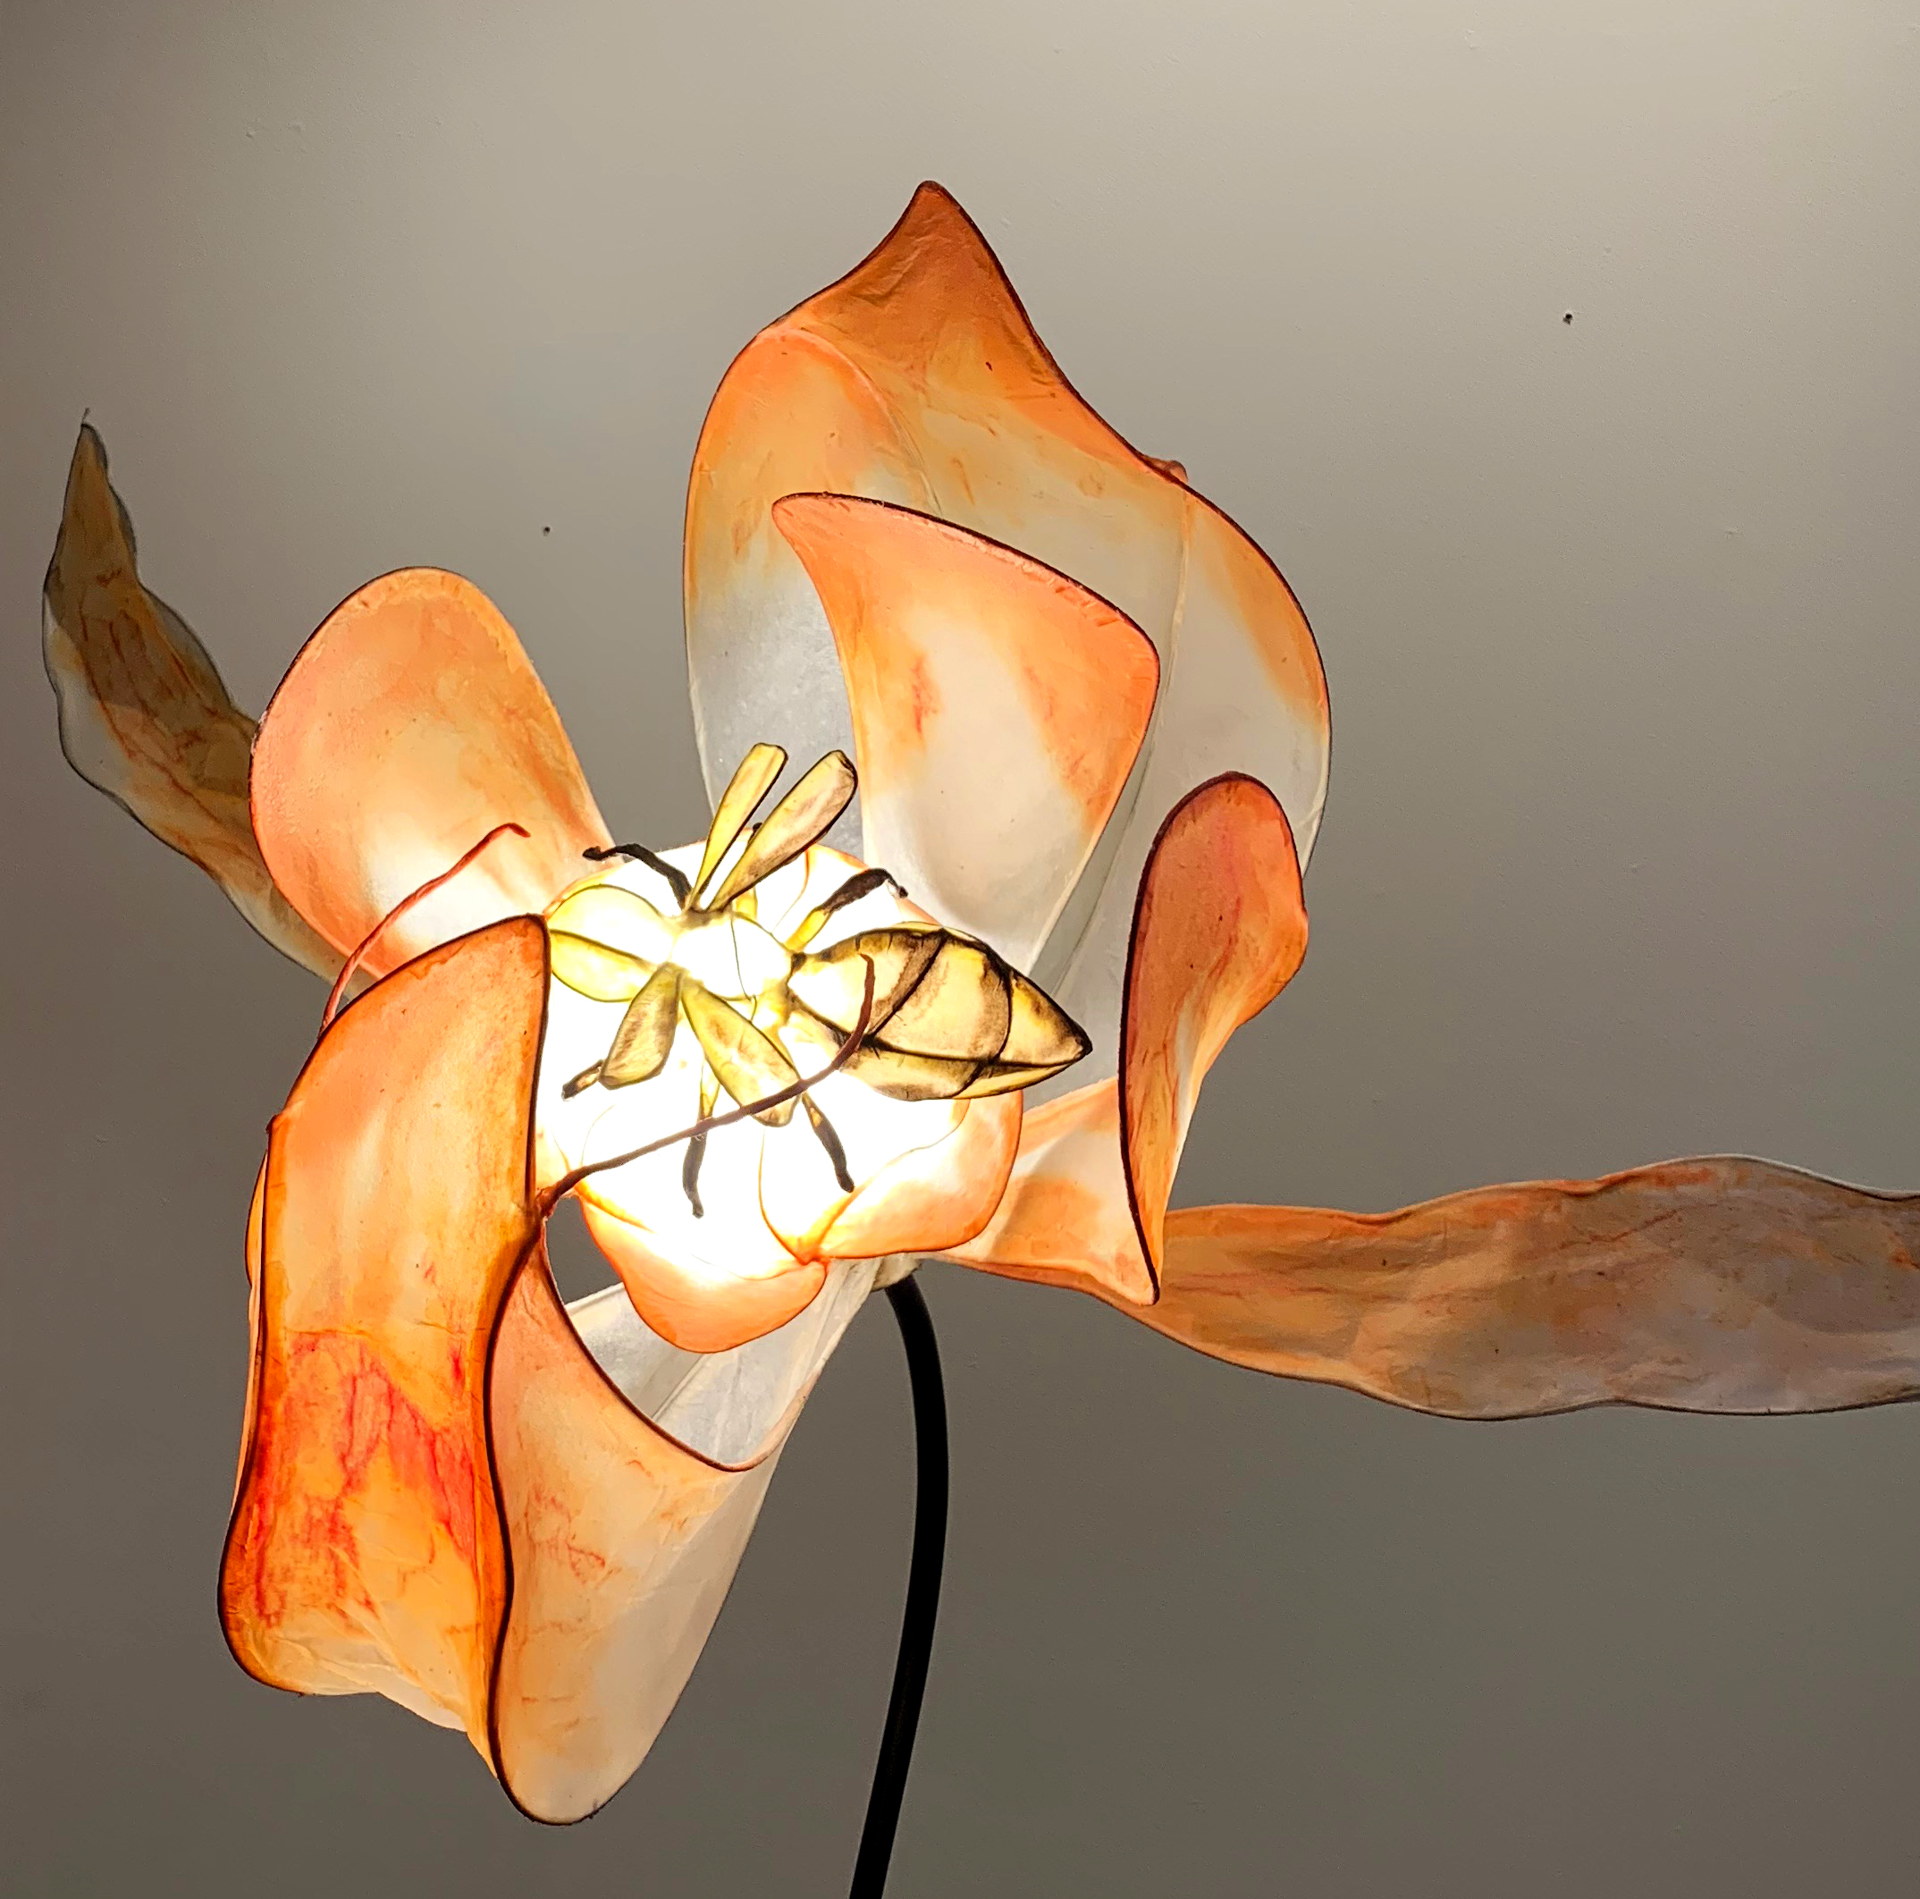 Bee + Pea Blossom / PBJ by HiiH Lights